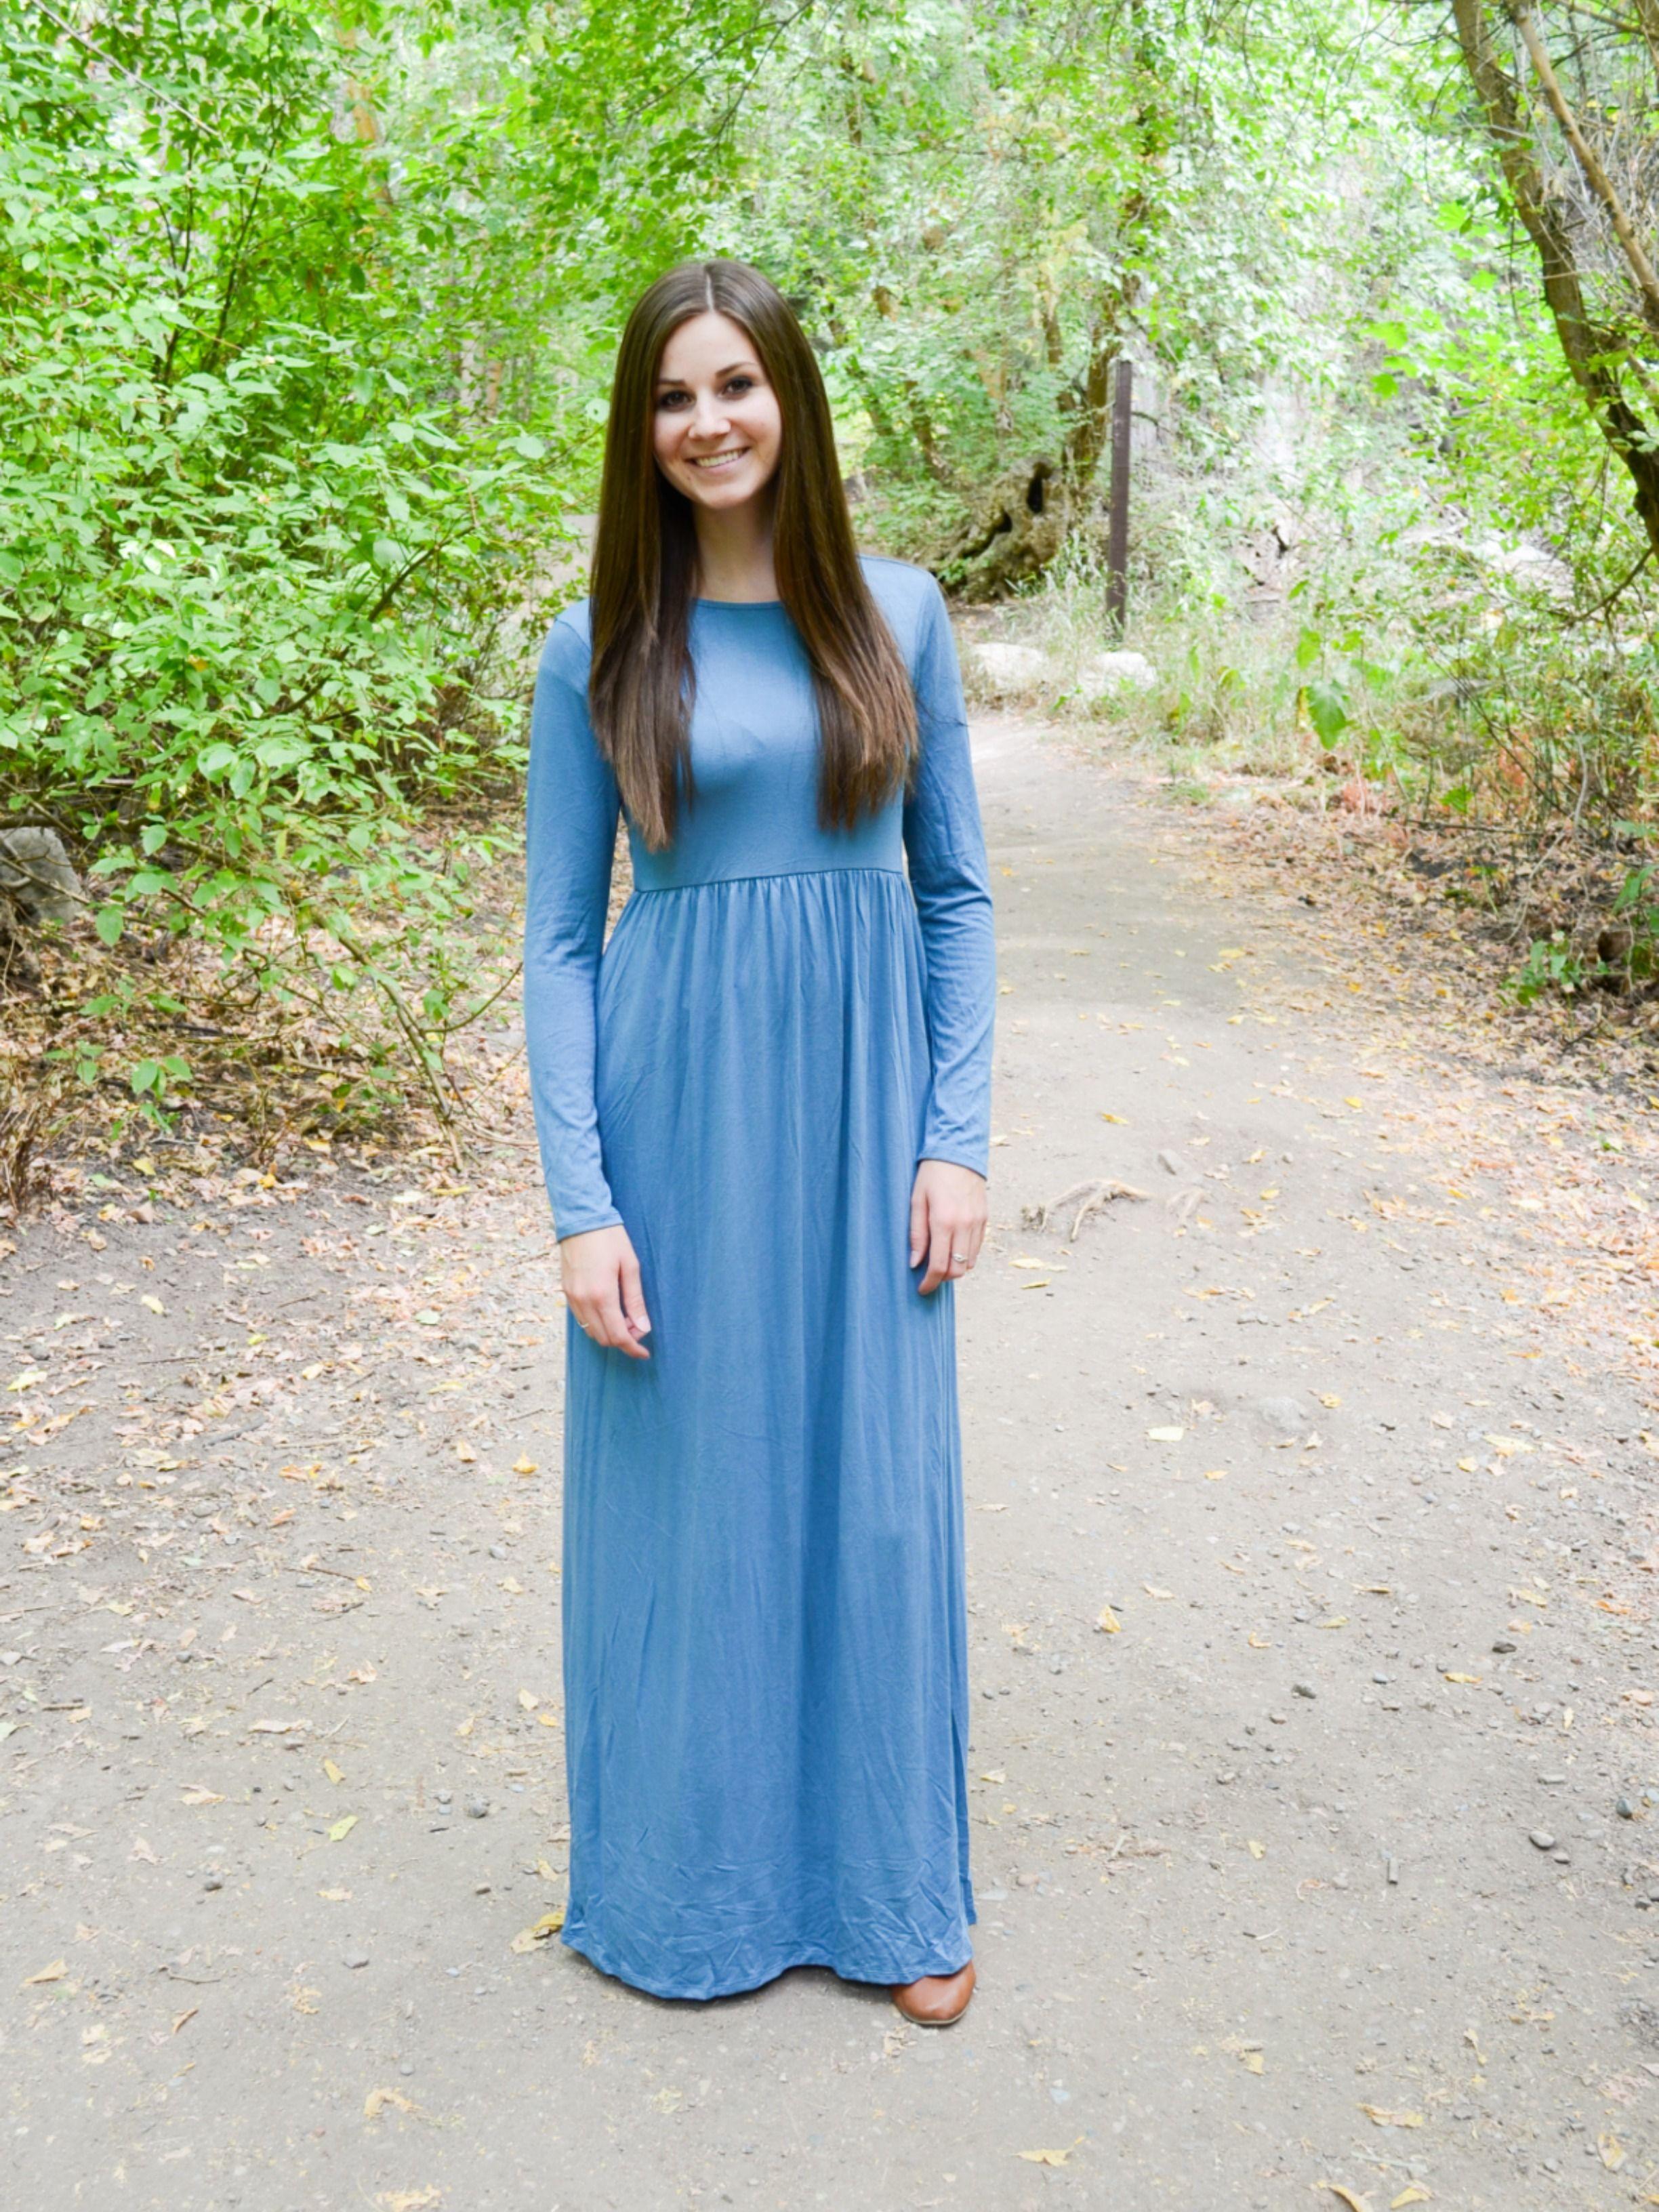 Long Sleeve Maxi Dress With Pockets Modelos [ 3264 x 2448 Pixel ]